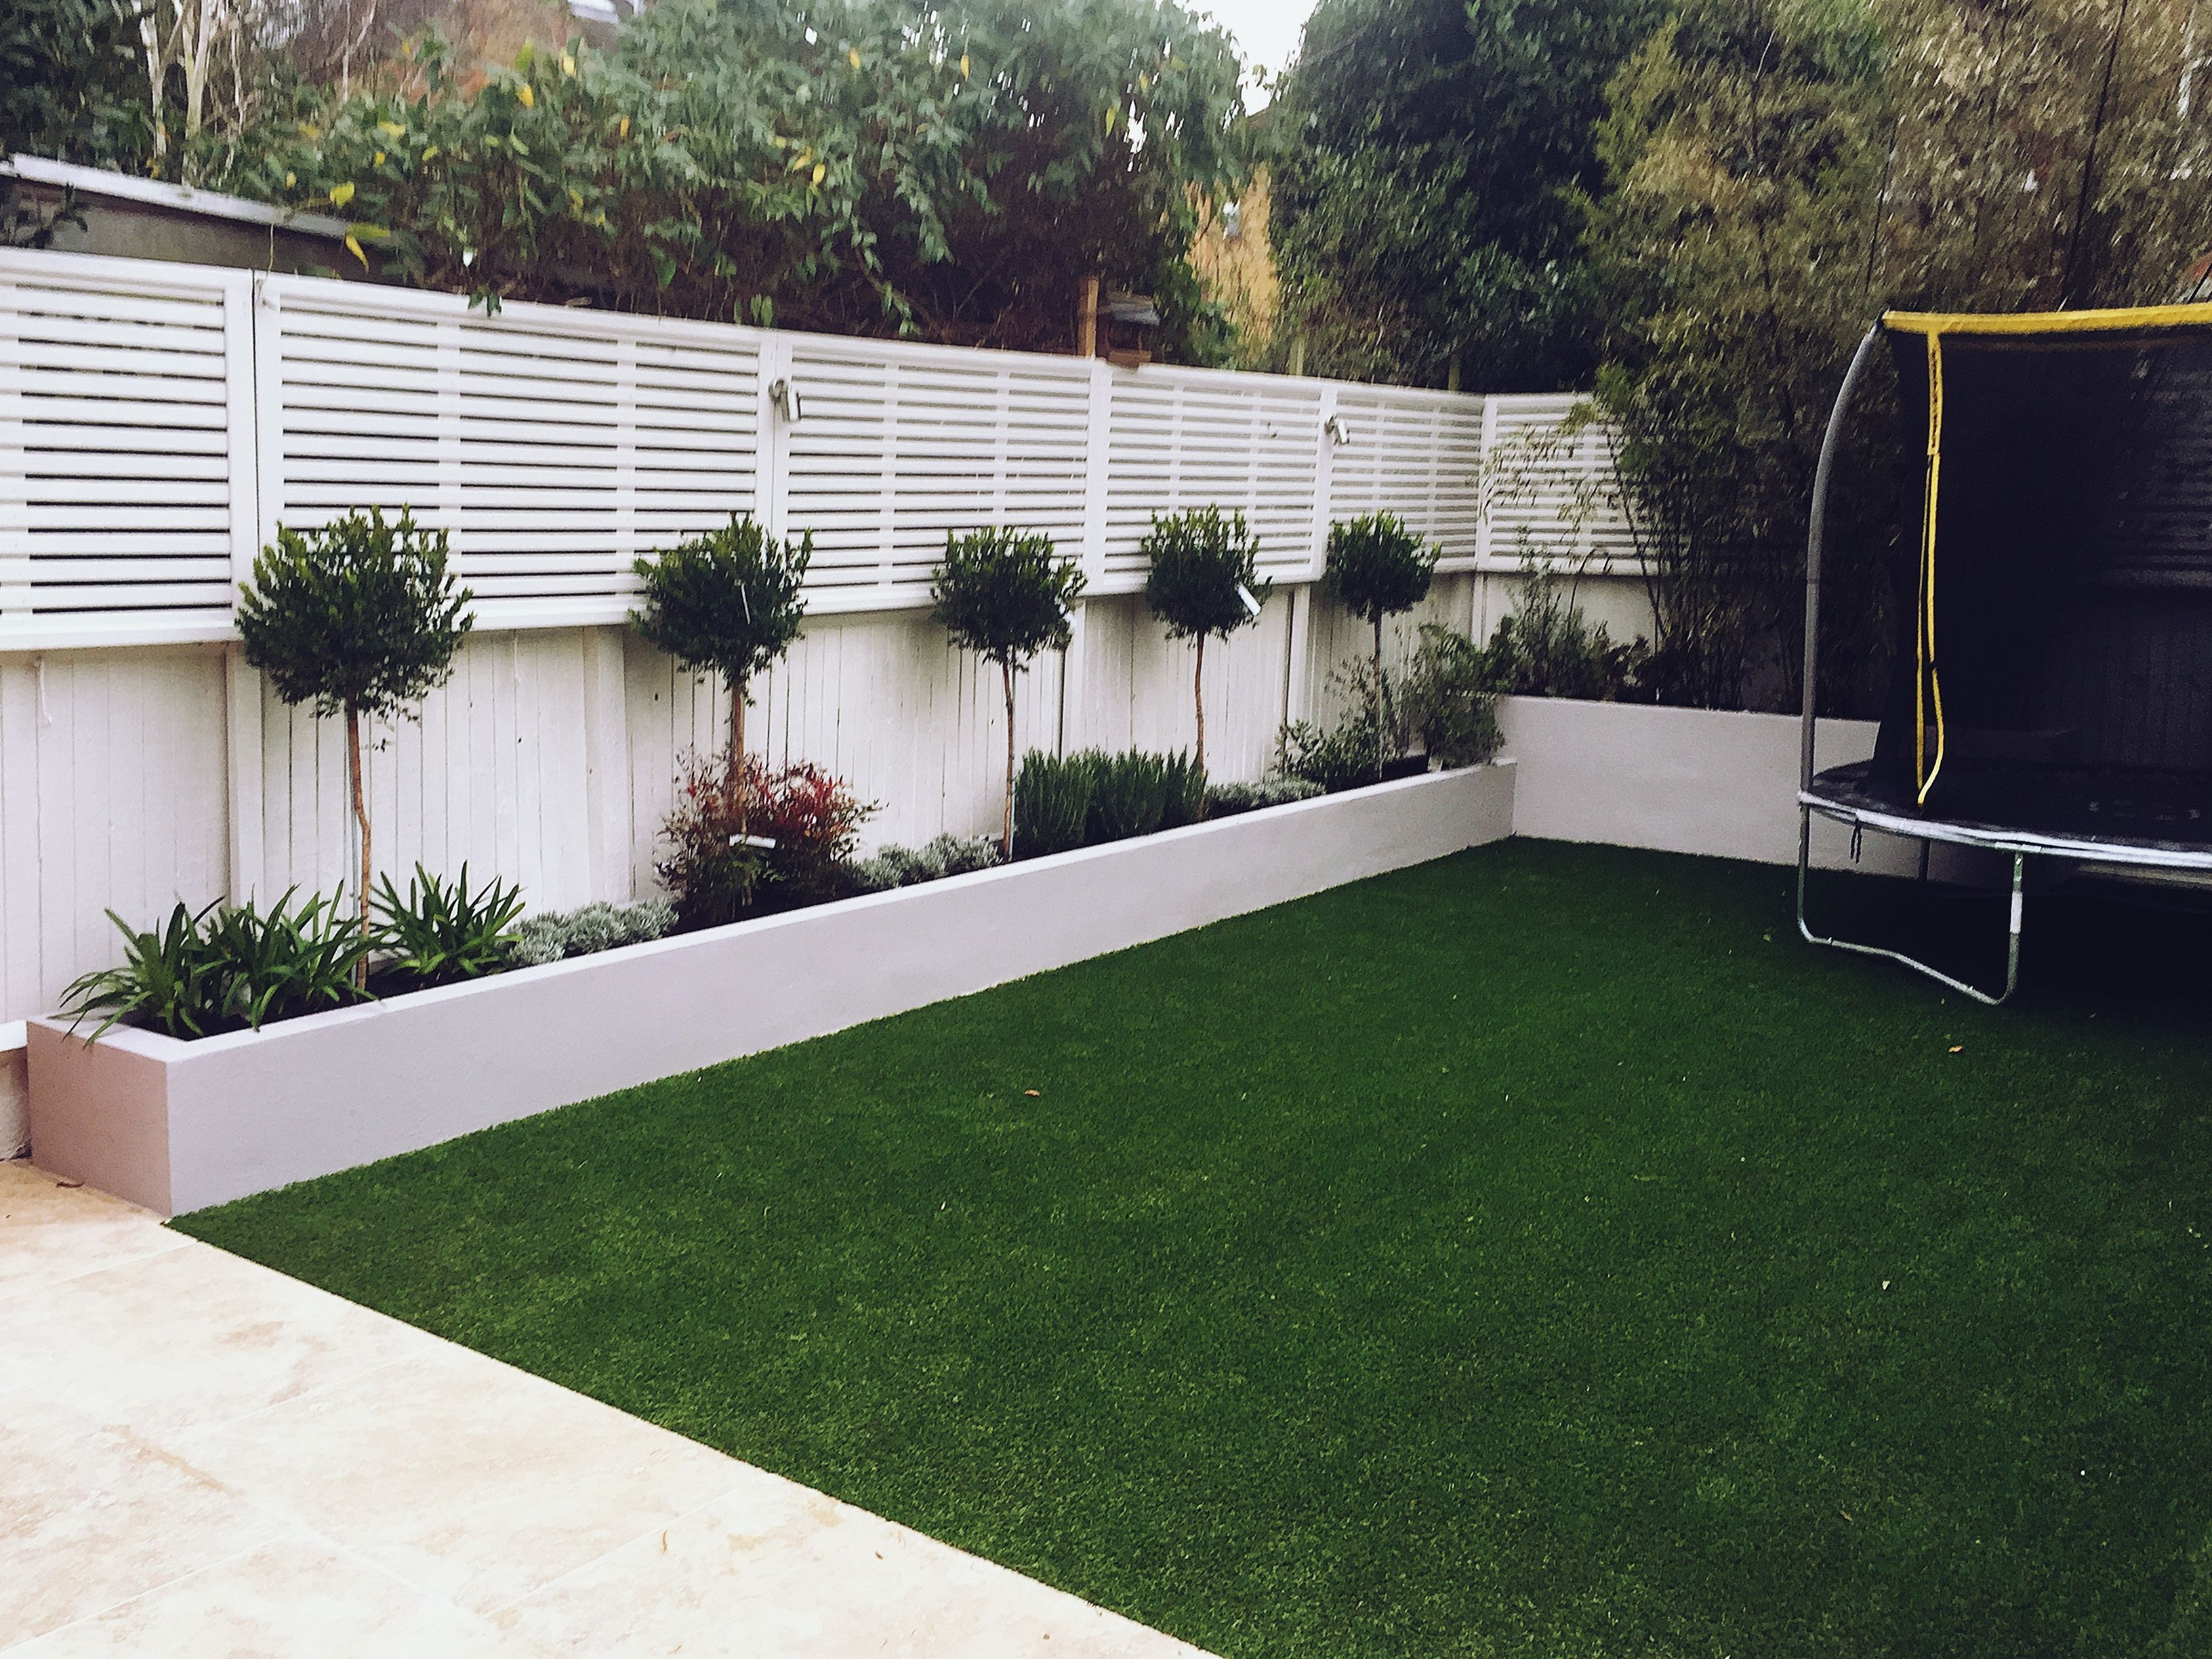 14 Most Creative Minimalist Garden Designs for Small ...